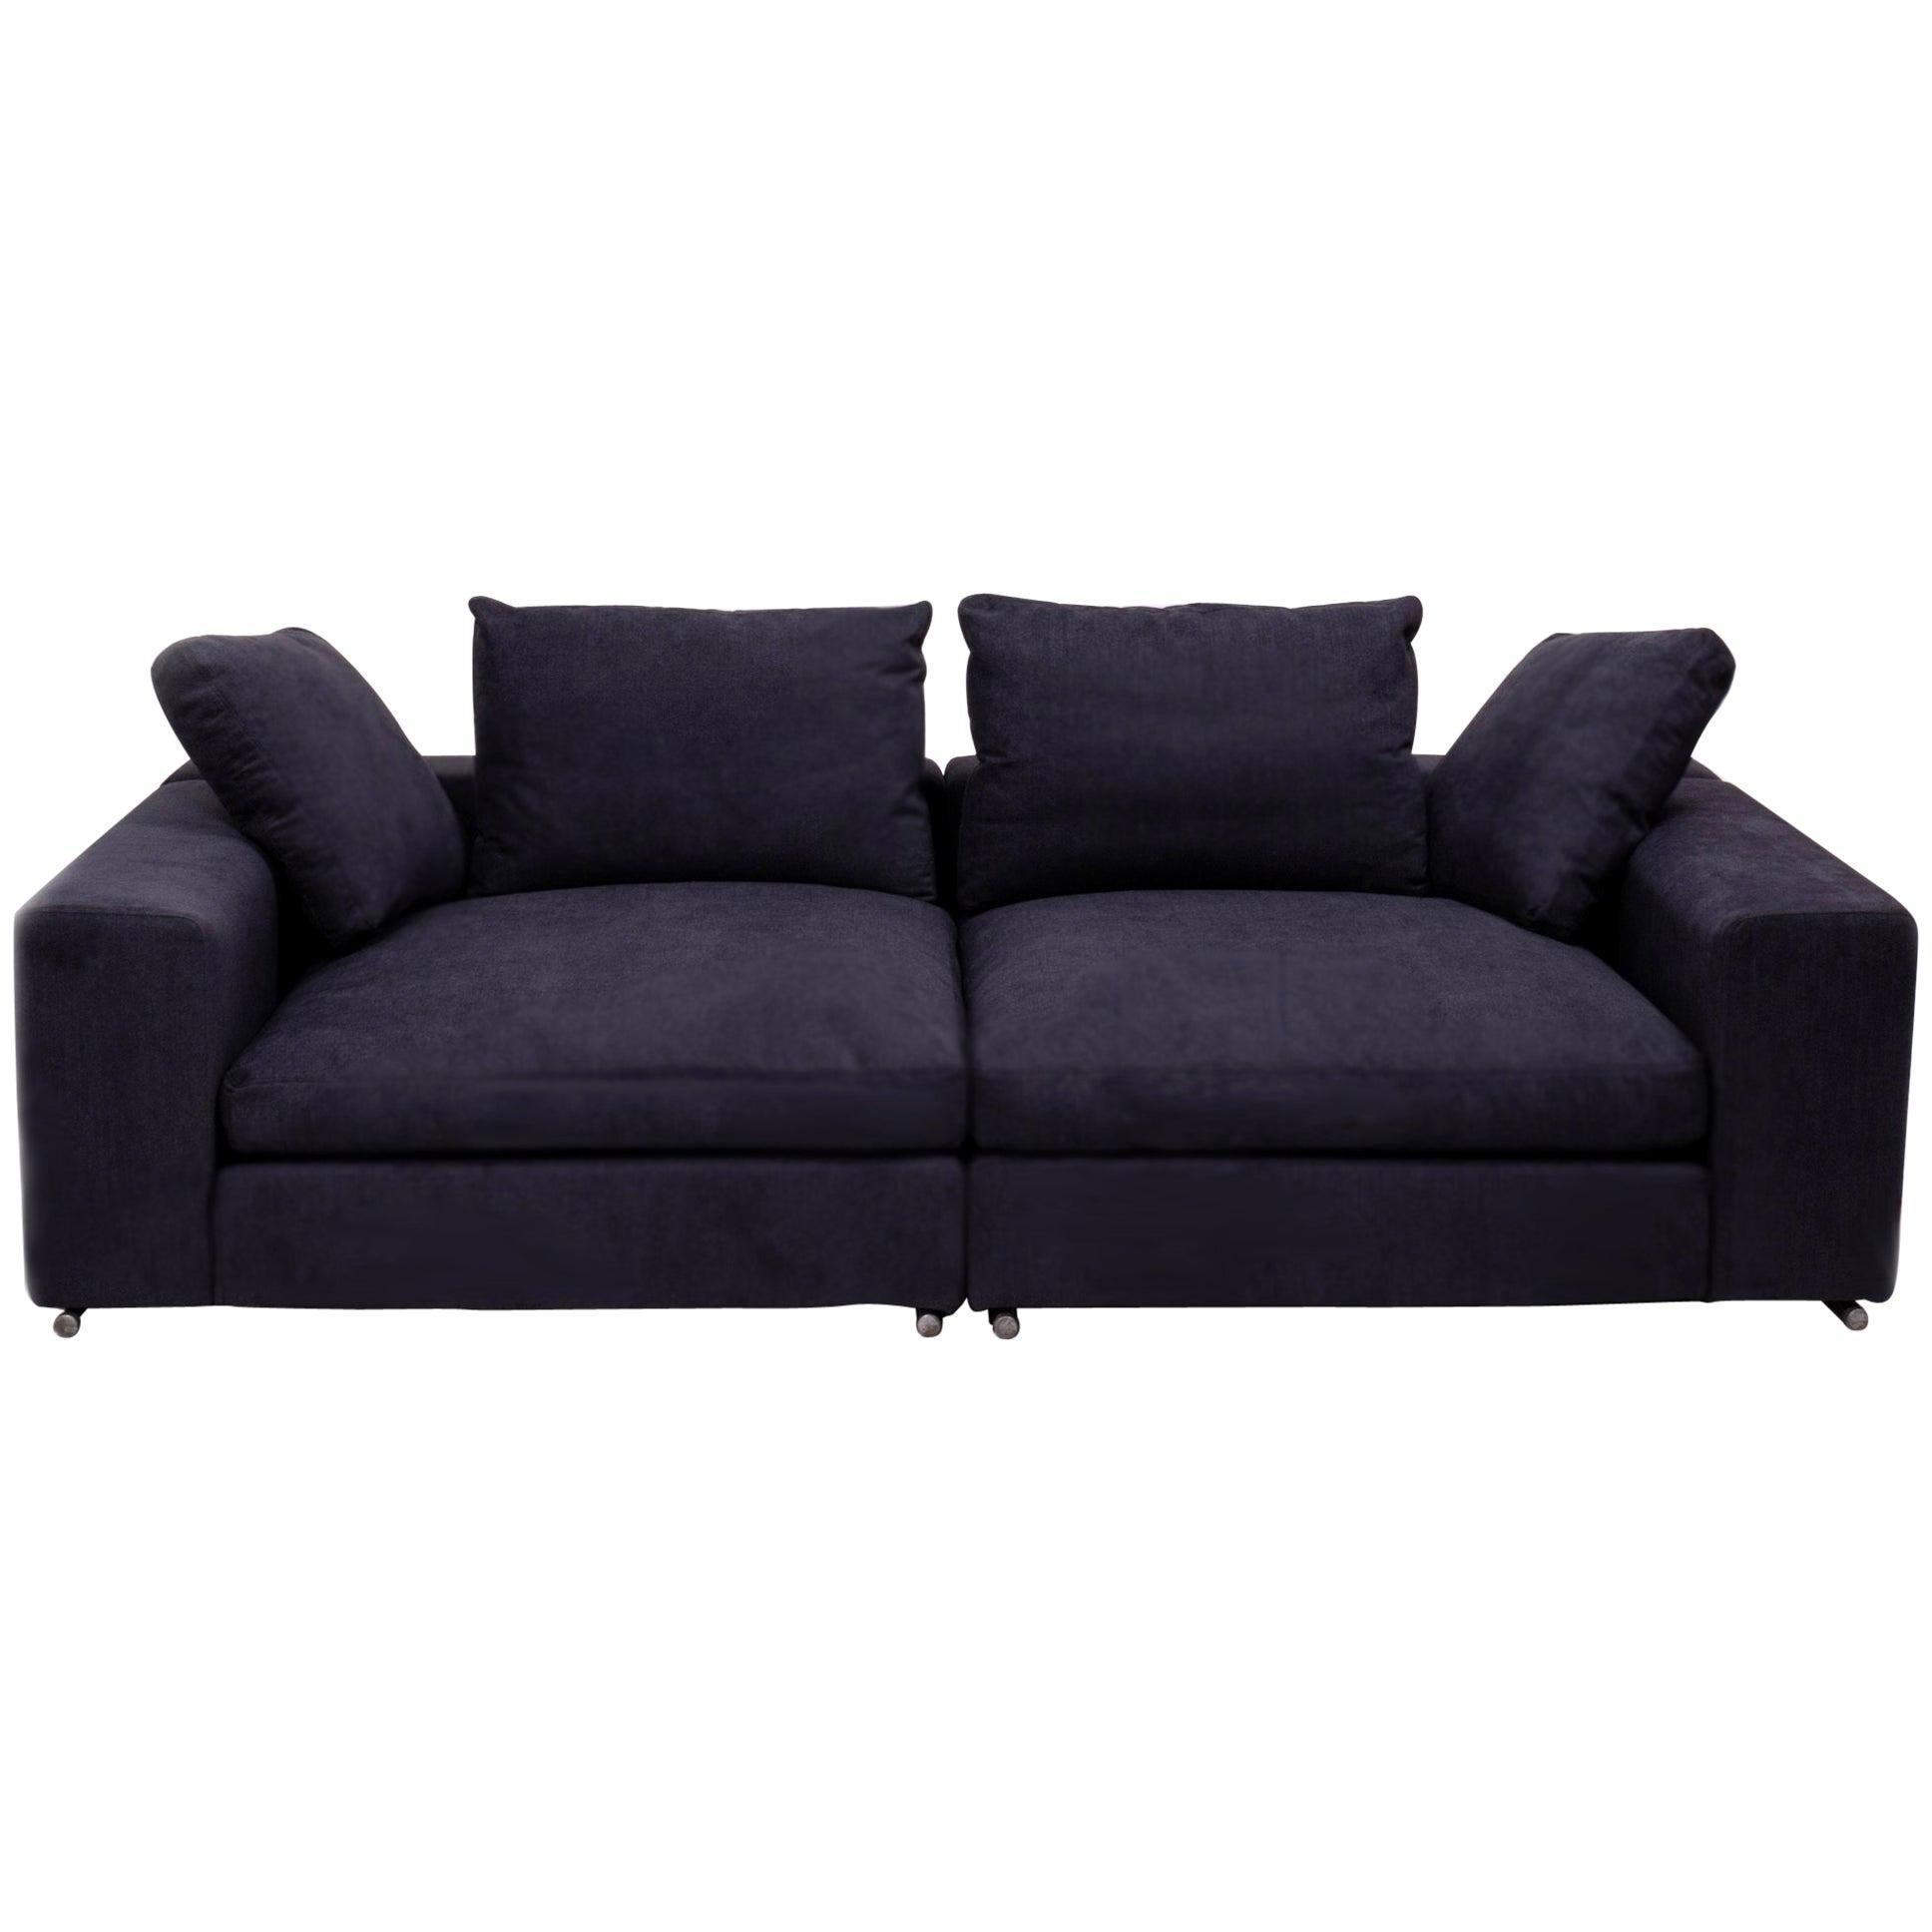 Flexform Vintage Slate Grey Fabric Sofa